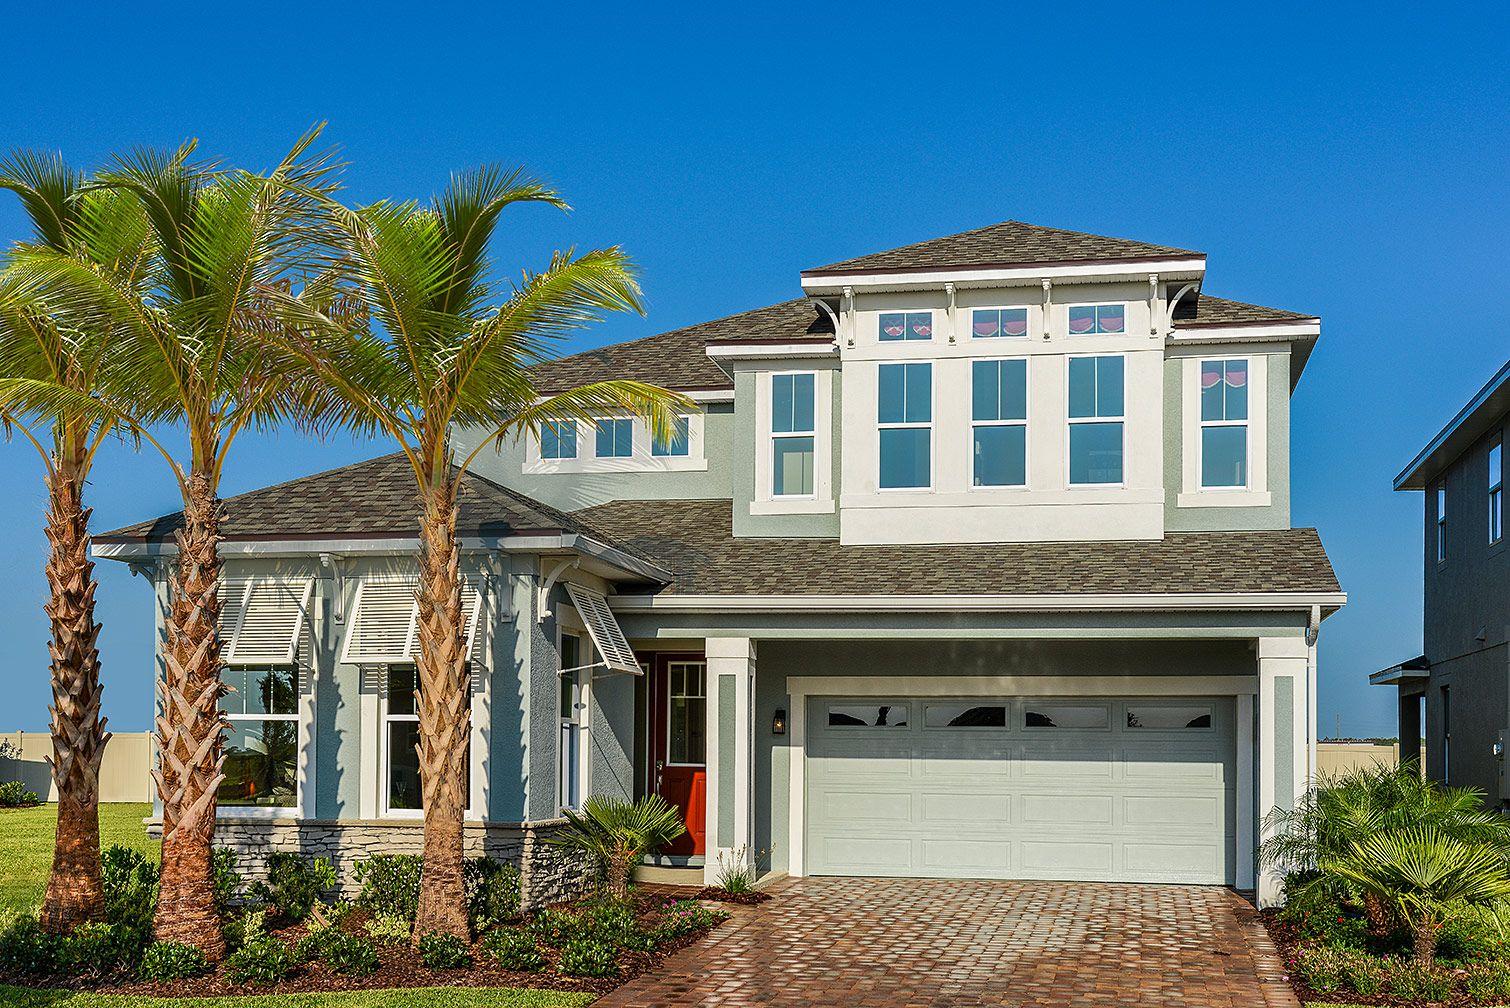 mattamy homes orlando fl communities homes for sale newhomesource